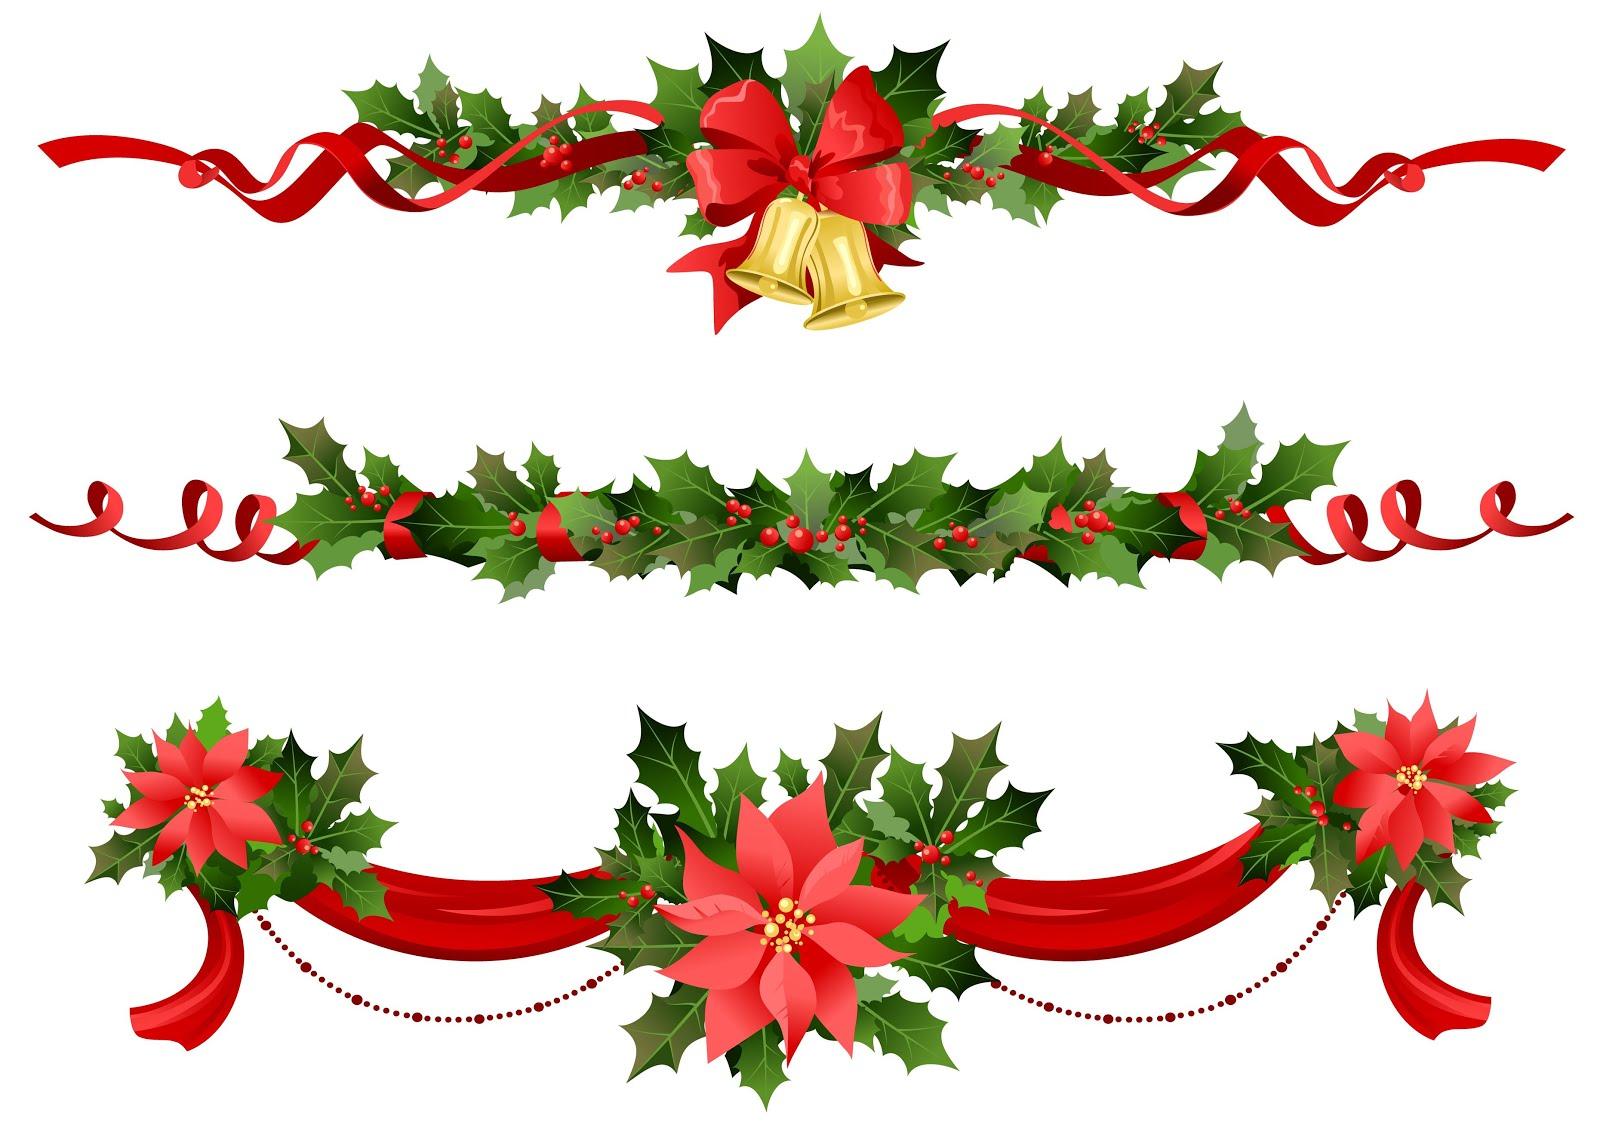 Imagen de cintas para adornos navide os frases de - Adornos colgantes de navidad ...